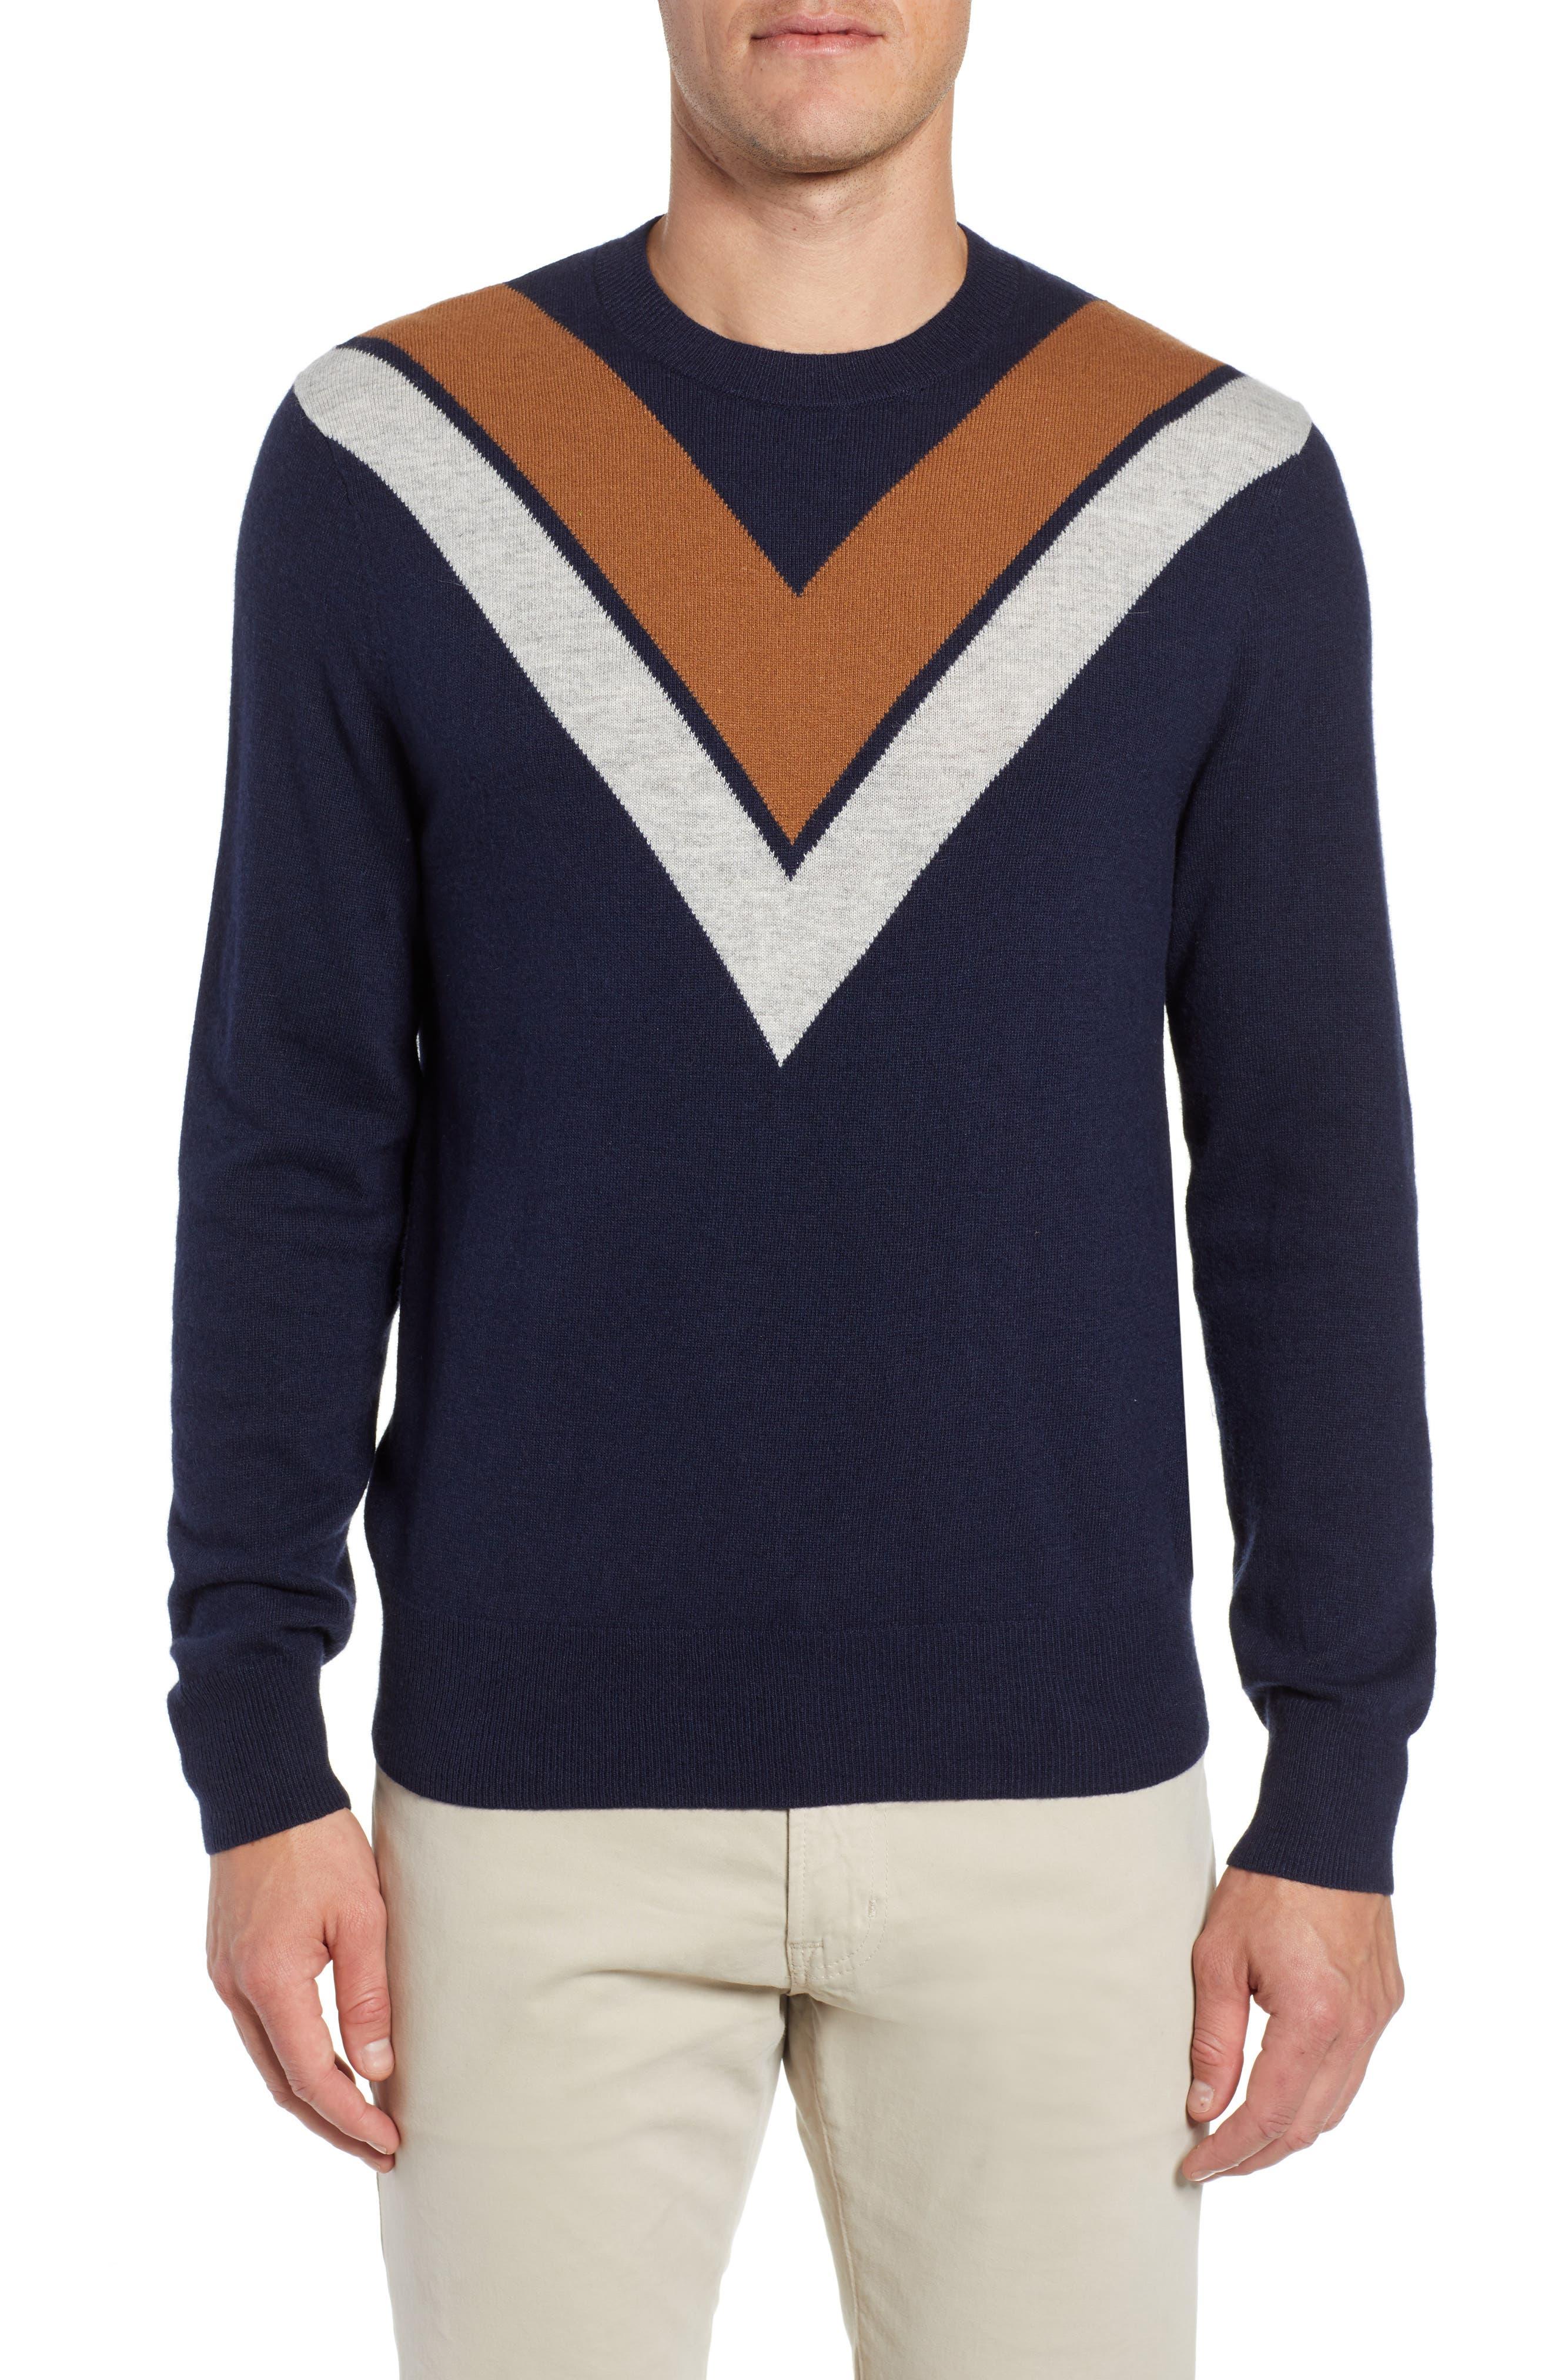 Minton V Crewneck Sweater,                             Main thumbnail 1, color,                             DARK NAVY/ LHN/ BURNT SUGAR